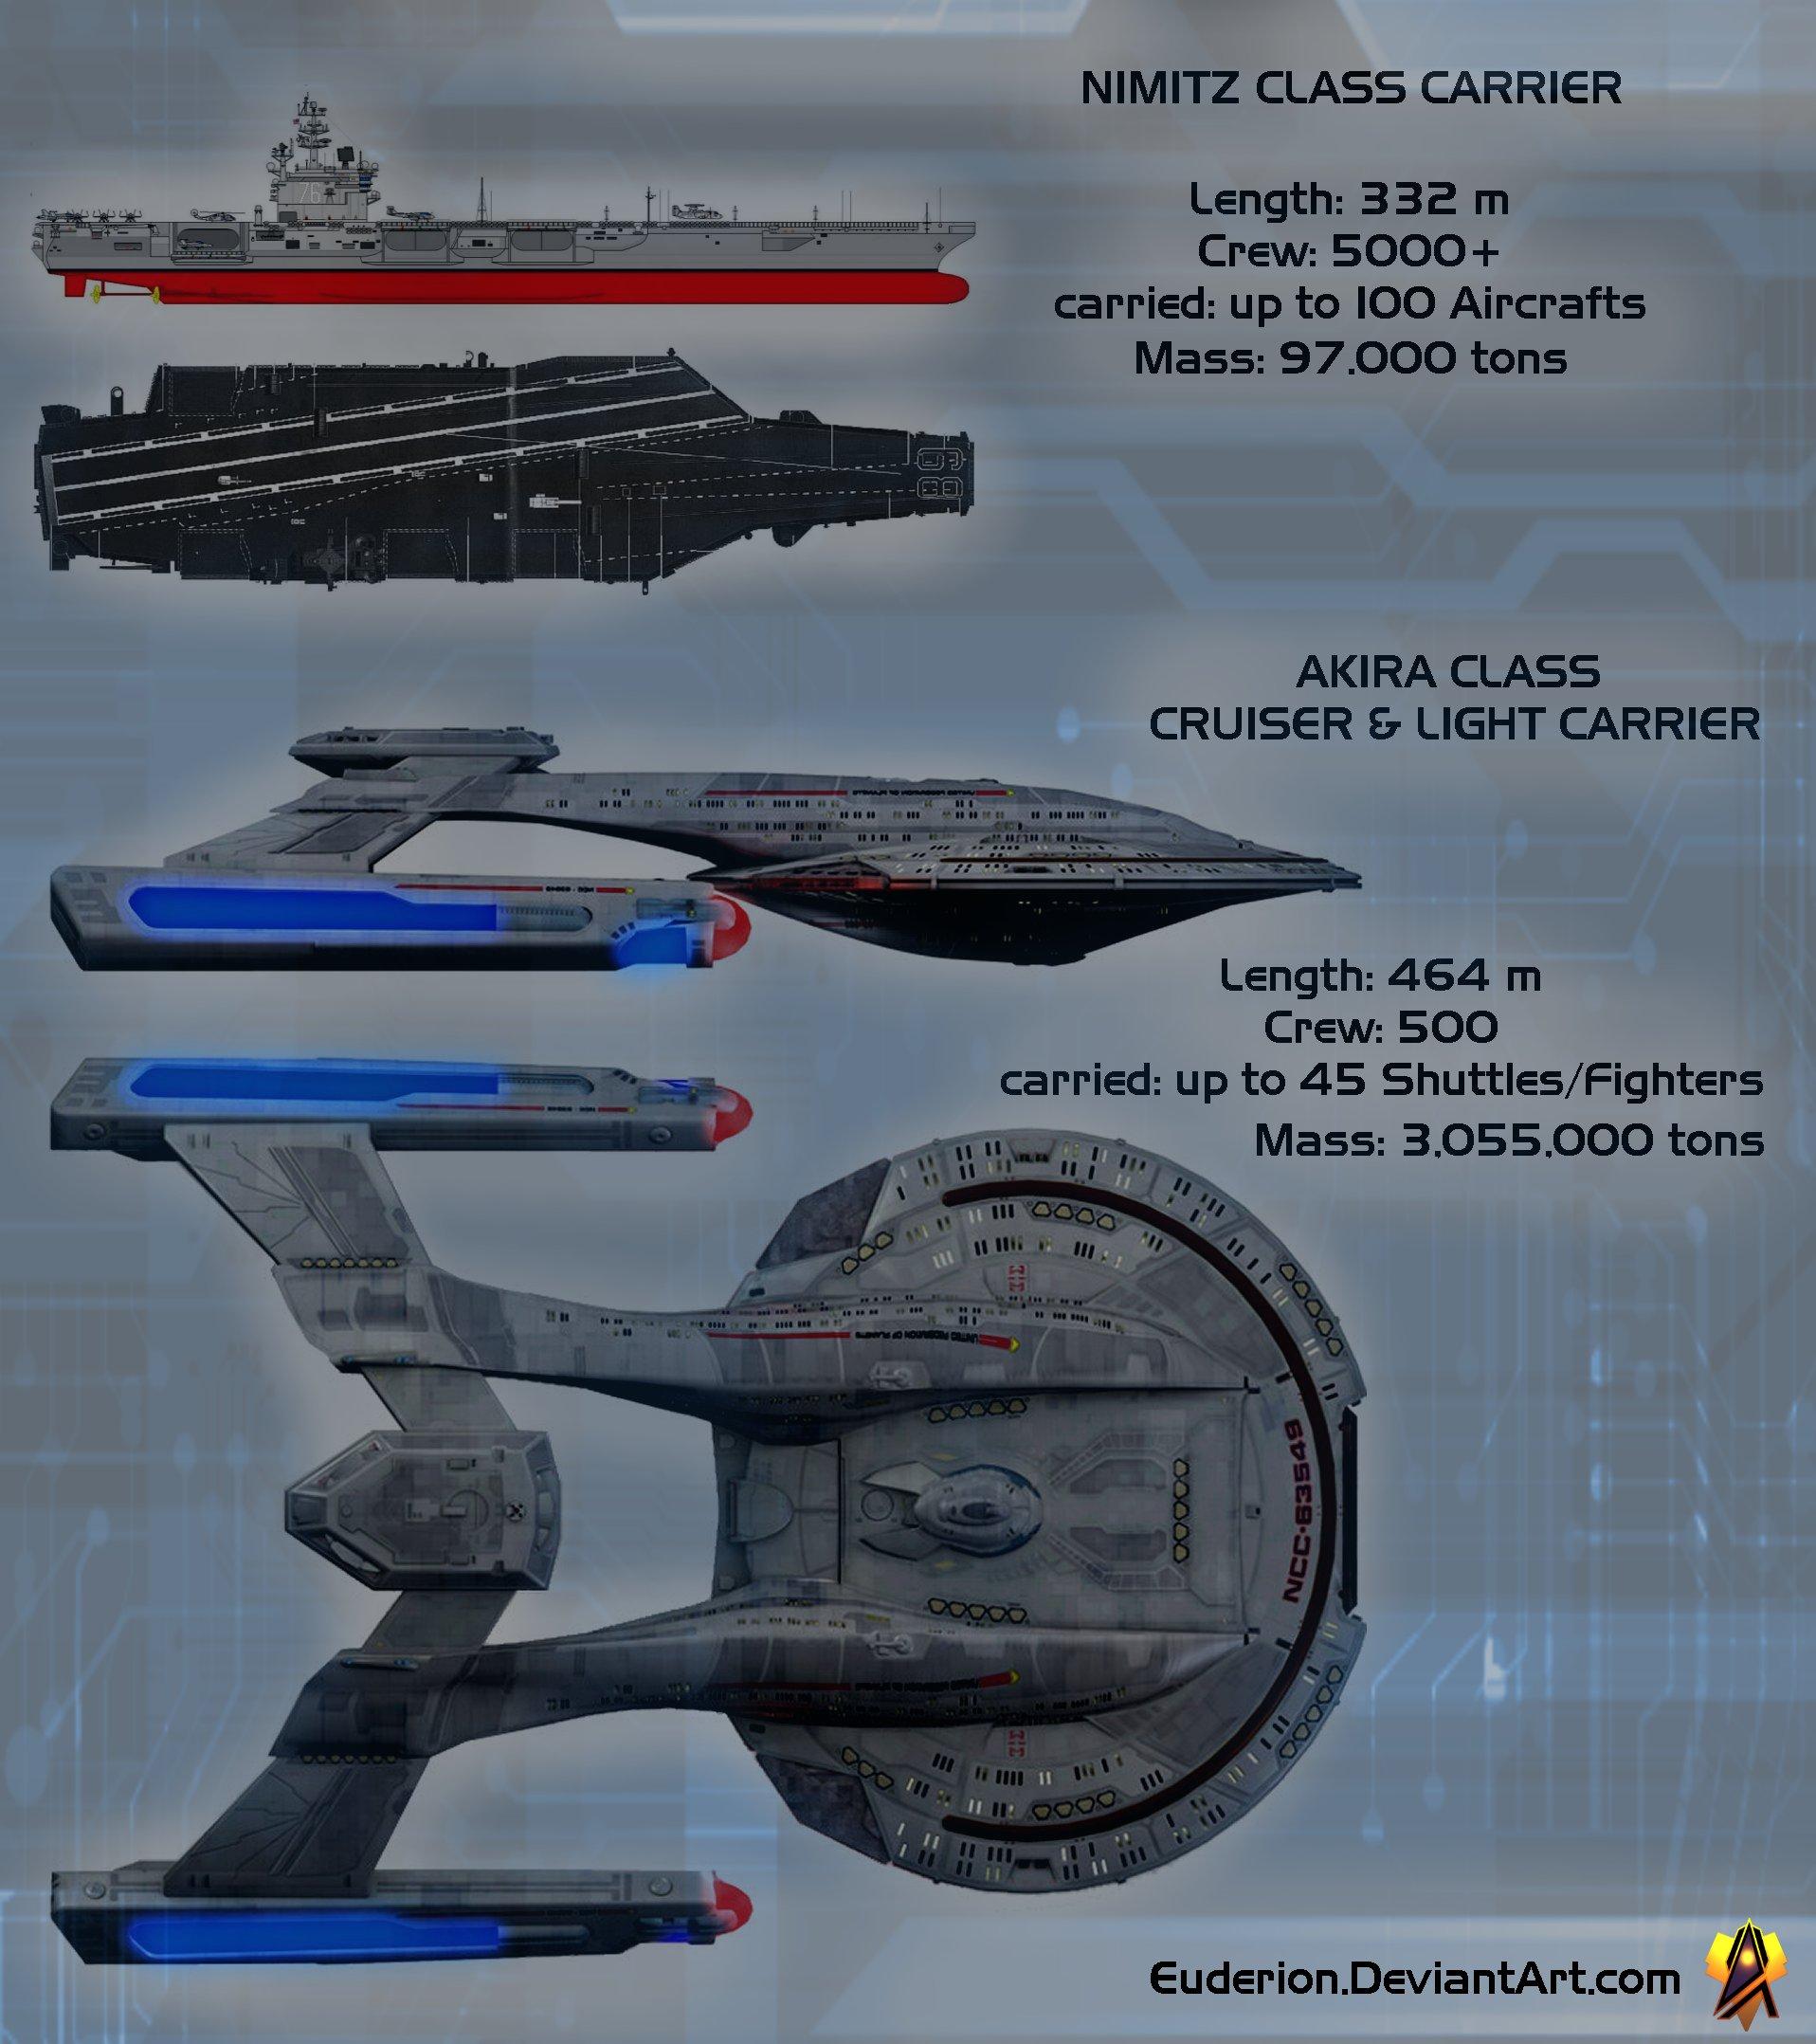 Nimitz vs Akira Size Comparison by Euderion on DeviantArt